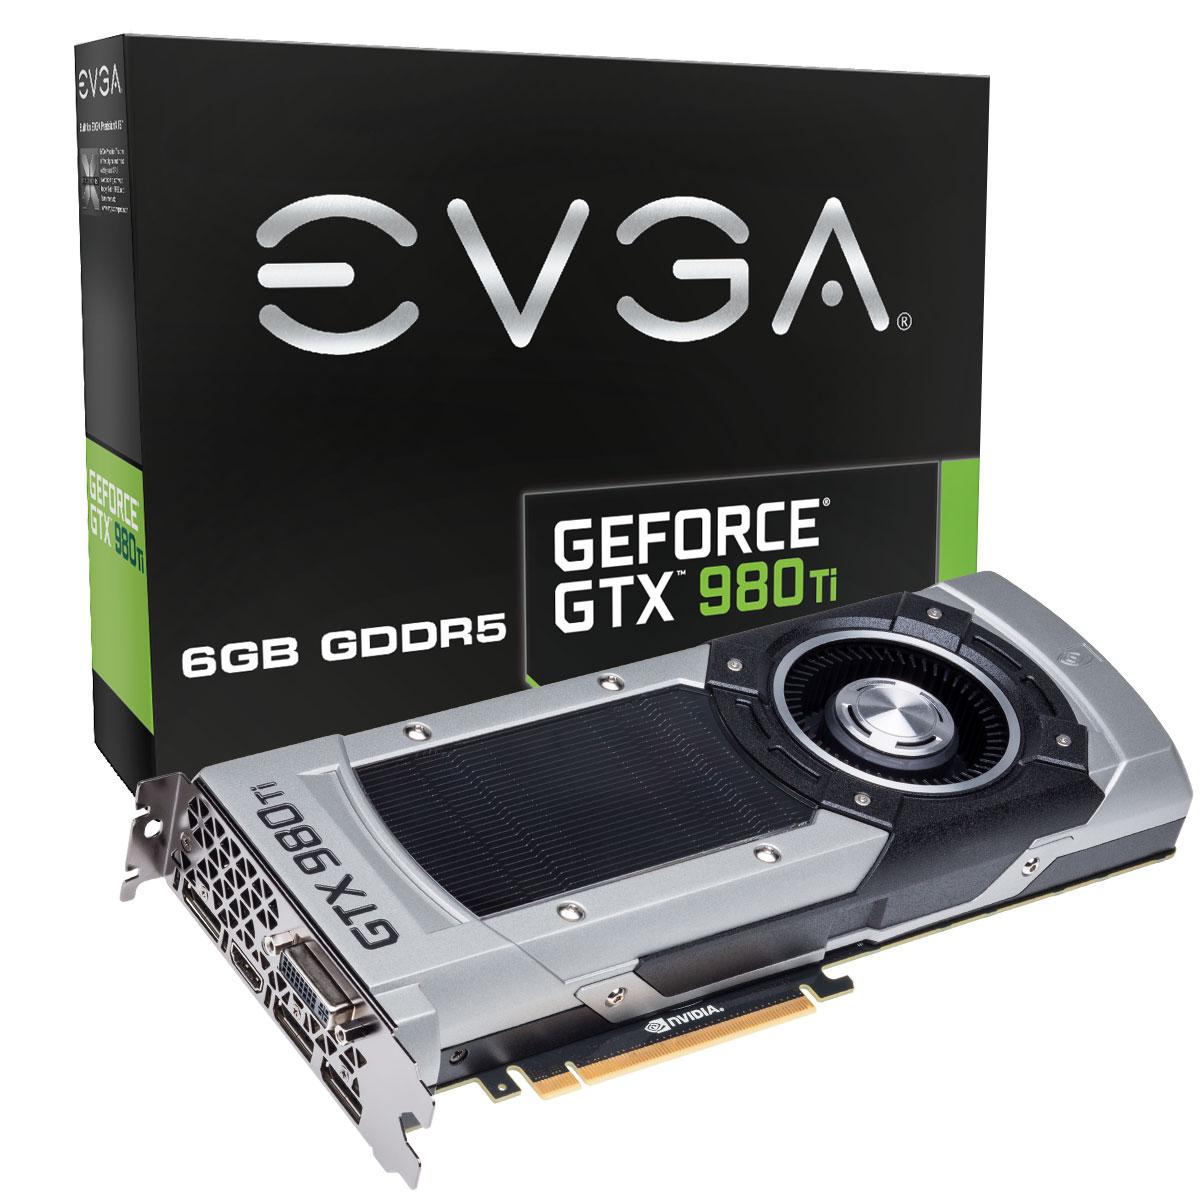 evga-geforce-gtx-980-ti_reference